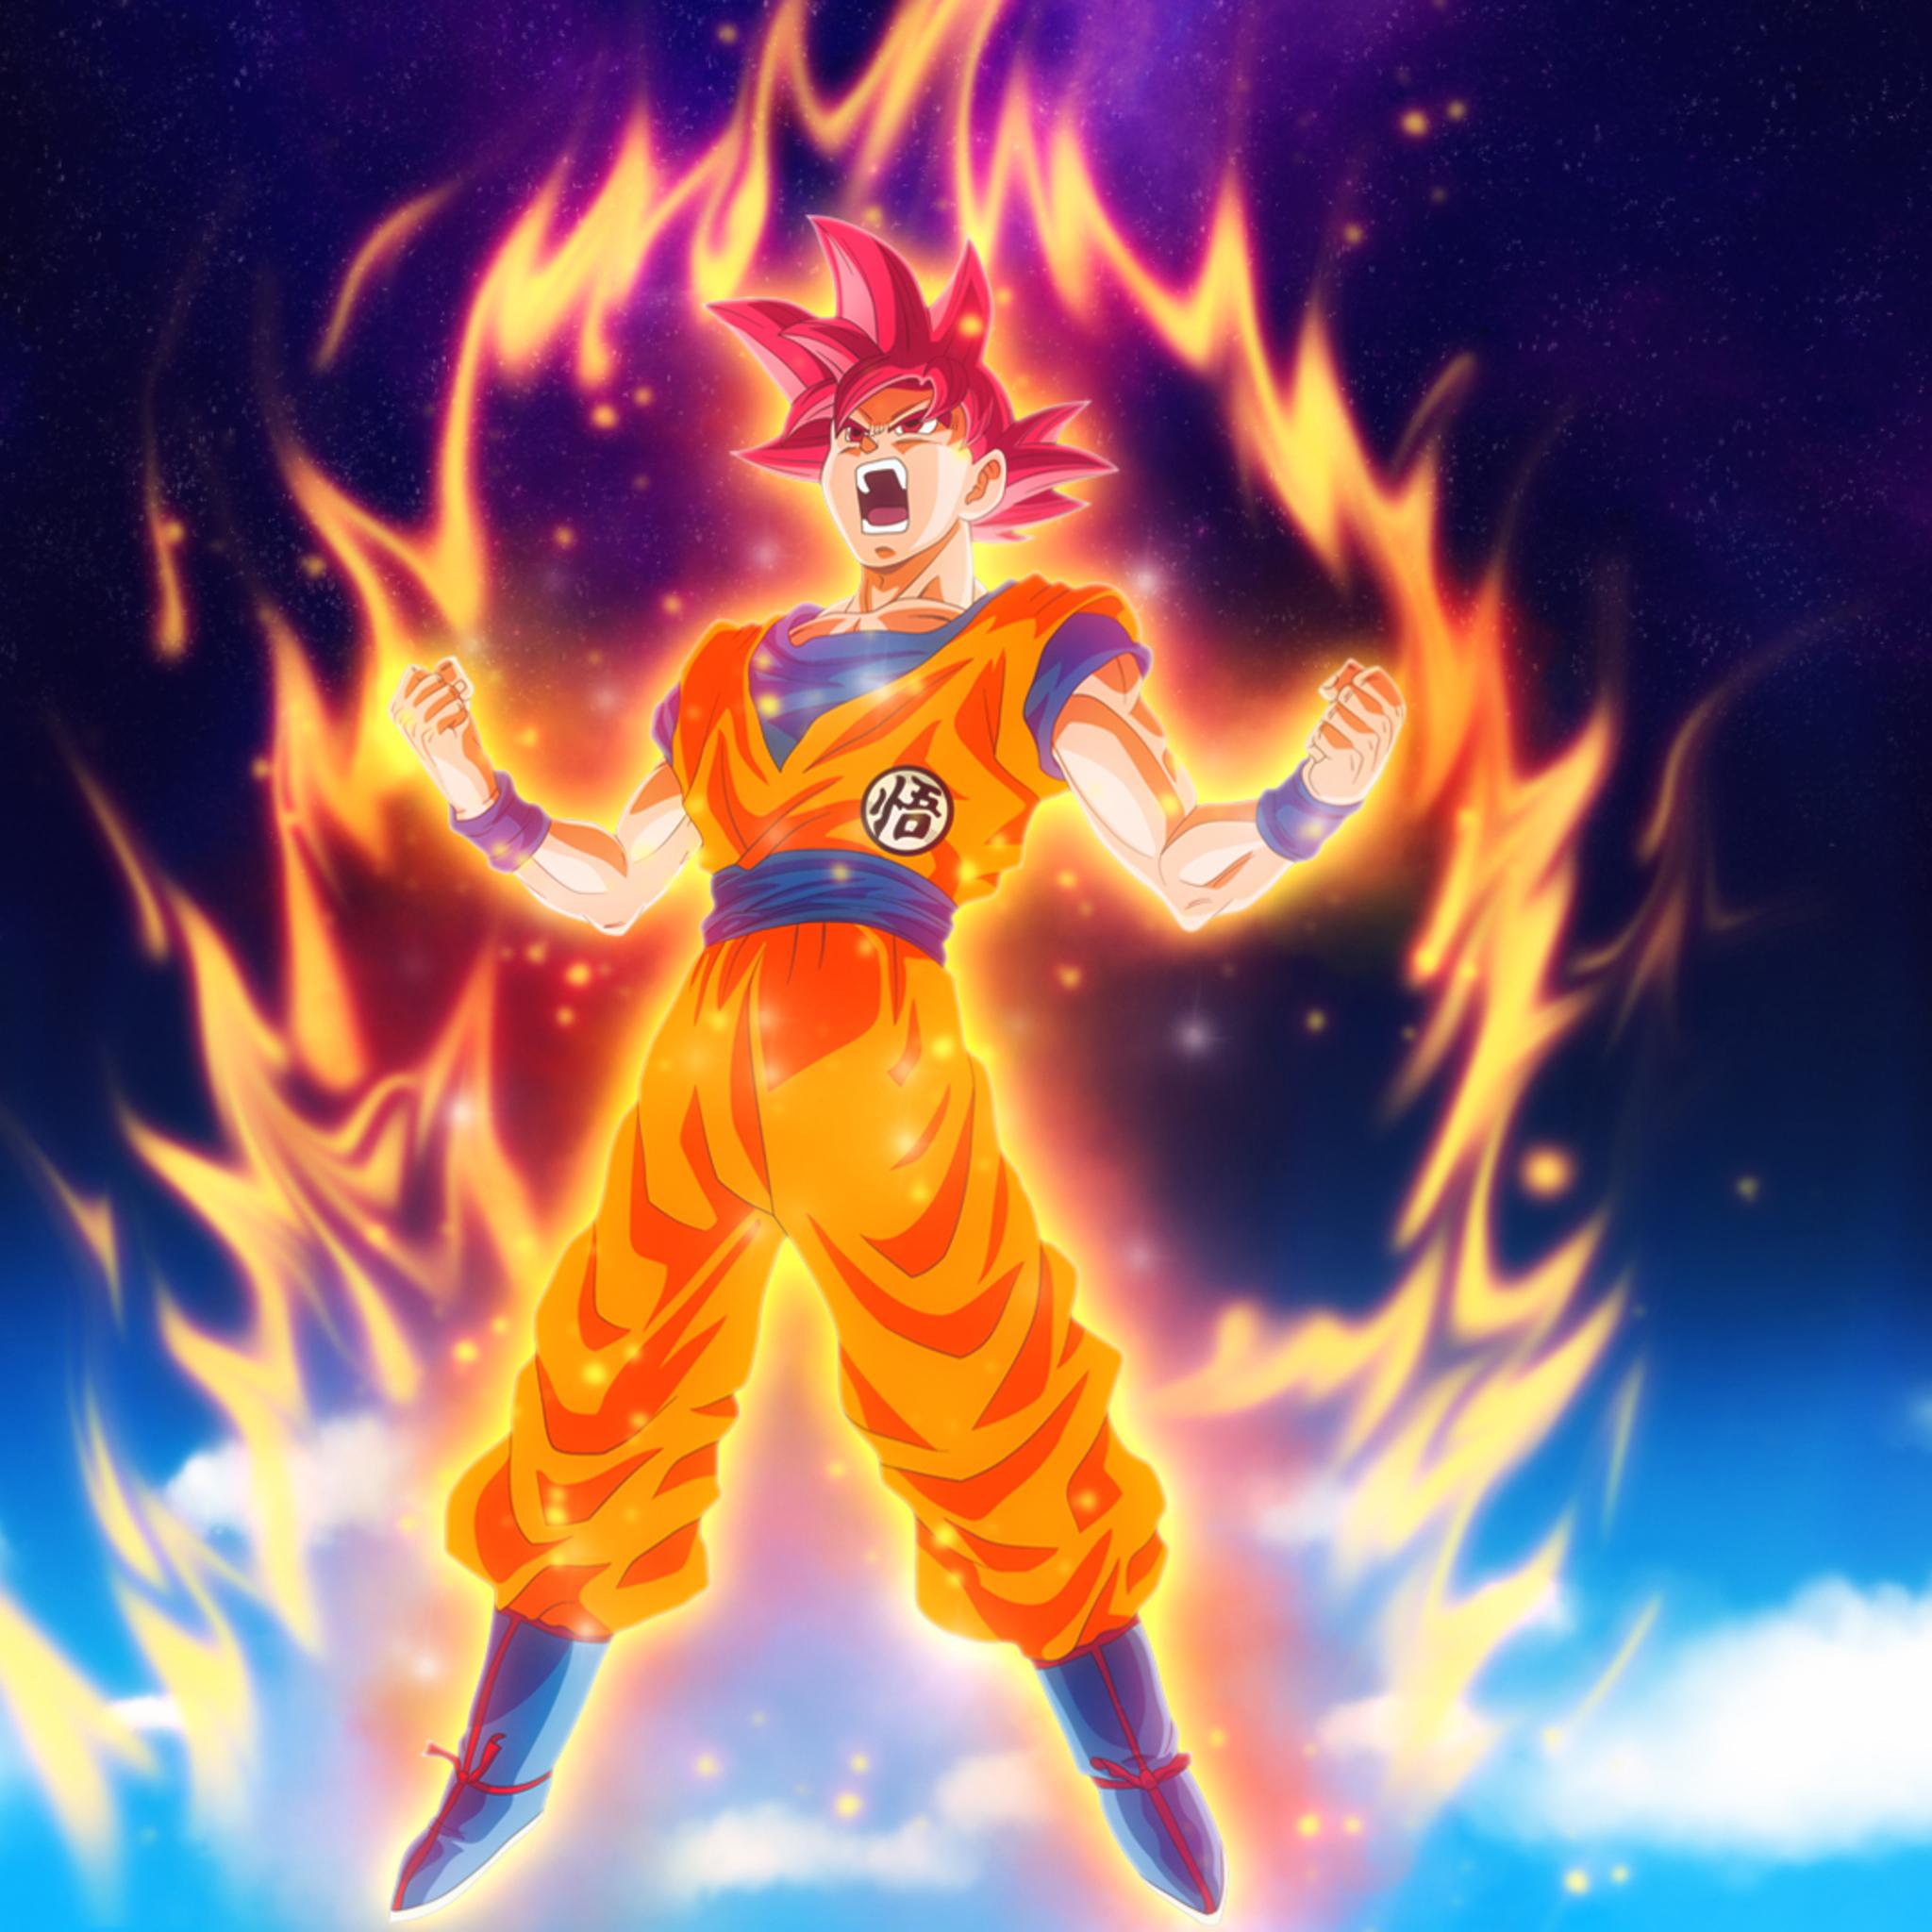 2048x2048 Goku Dragon Ball Super Anime HD Ipad Air HD 4k Wallpapers, Images, Backgrounds, Photos ...